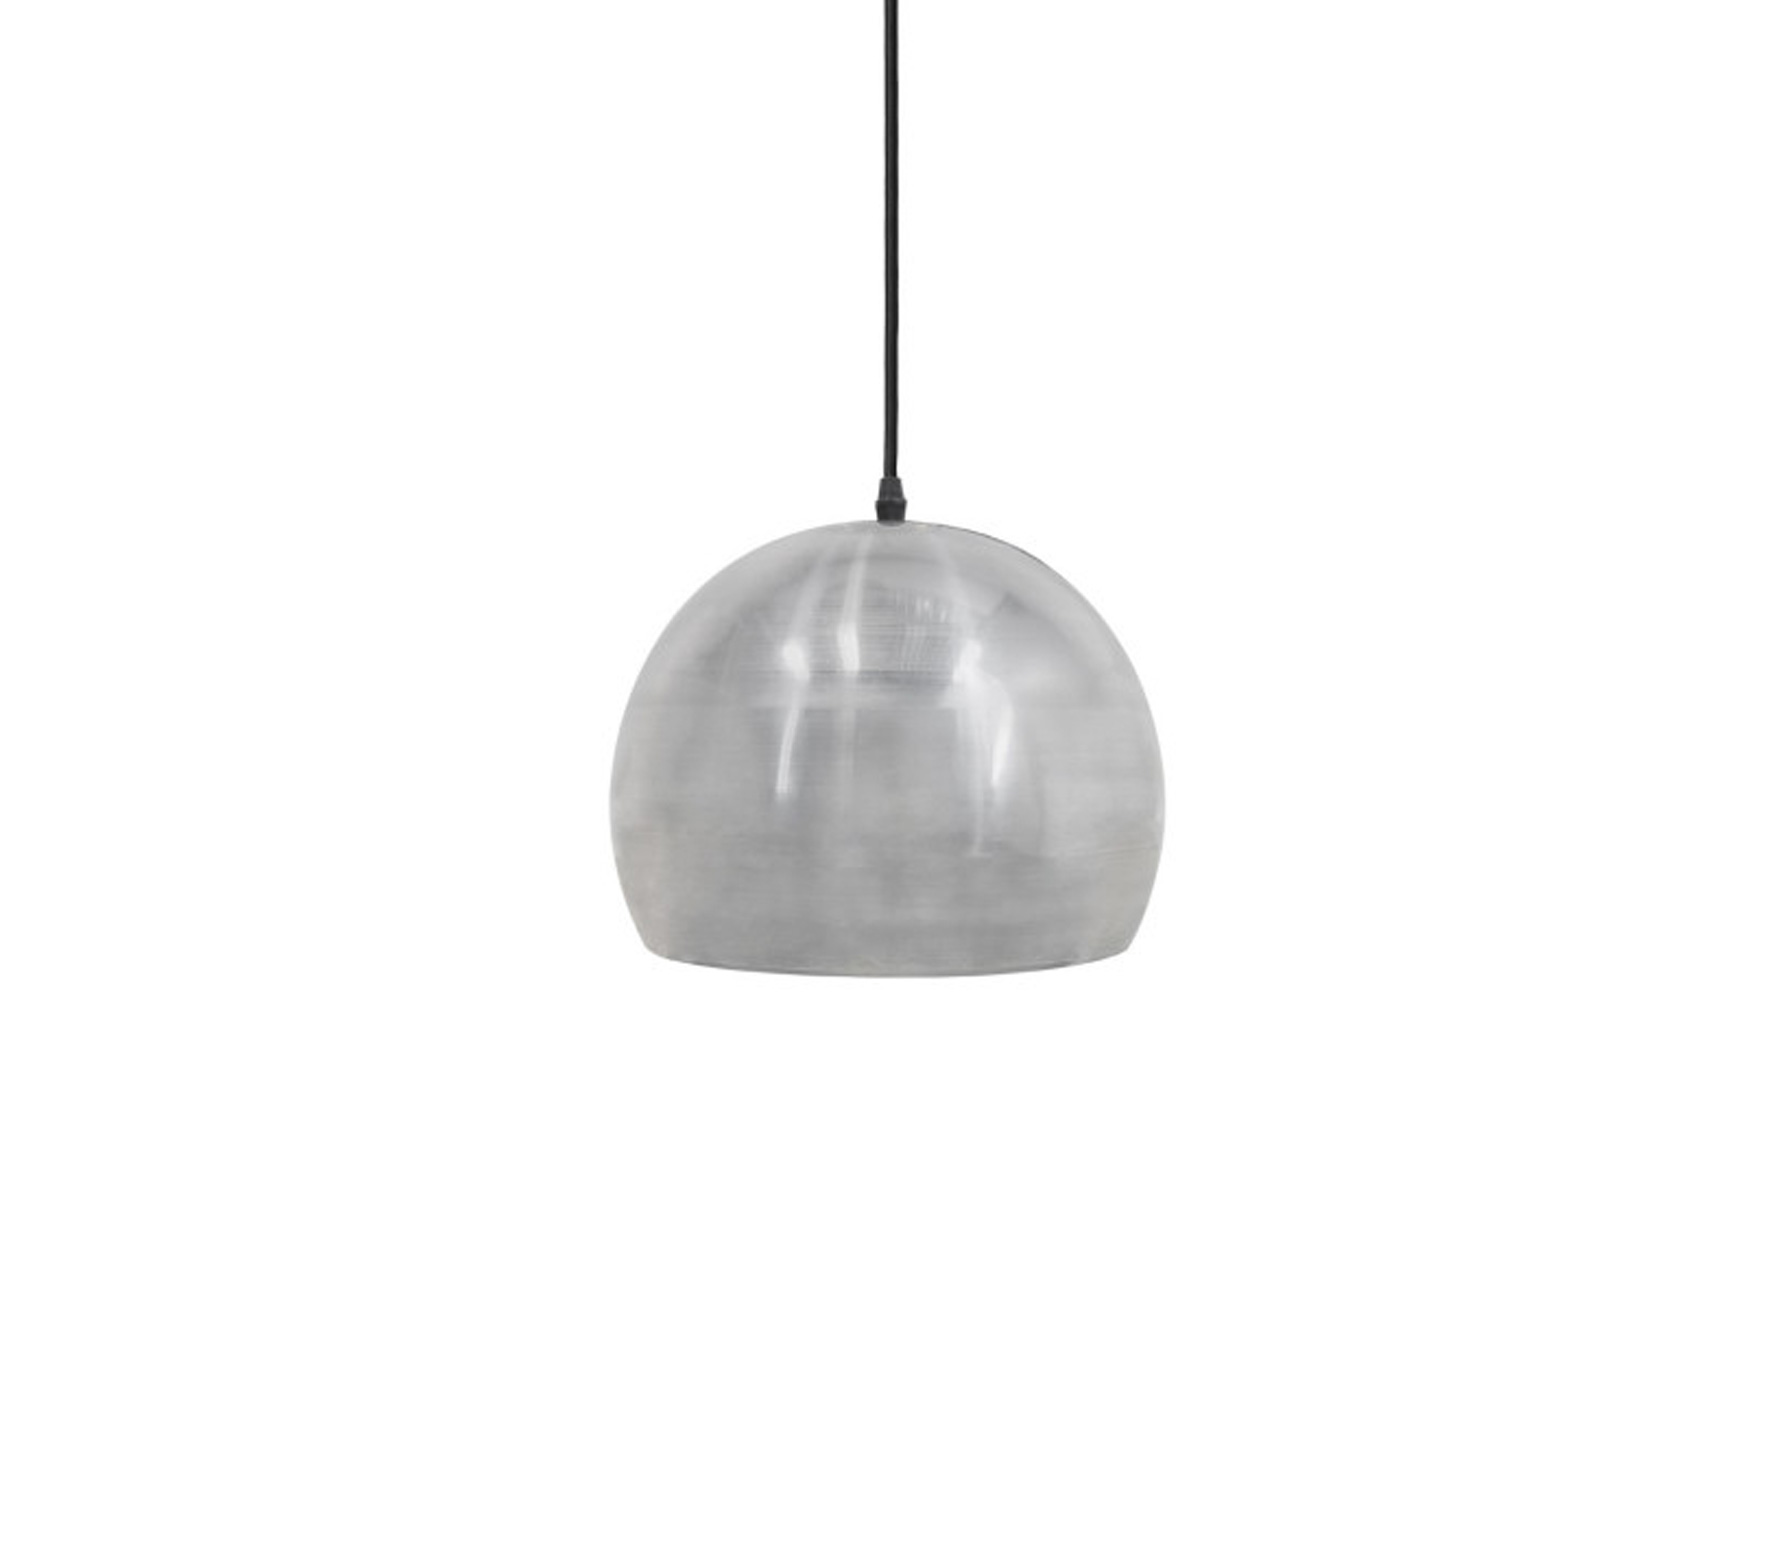 vtwonen Dot hanglamp � 27 cm zilver Zilver